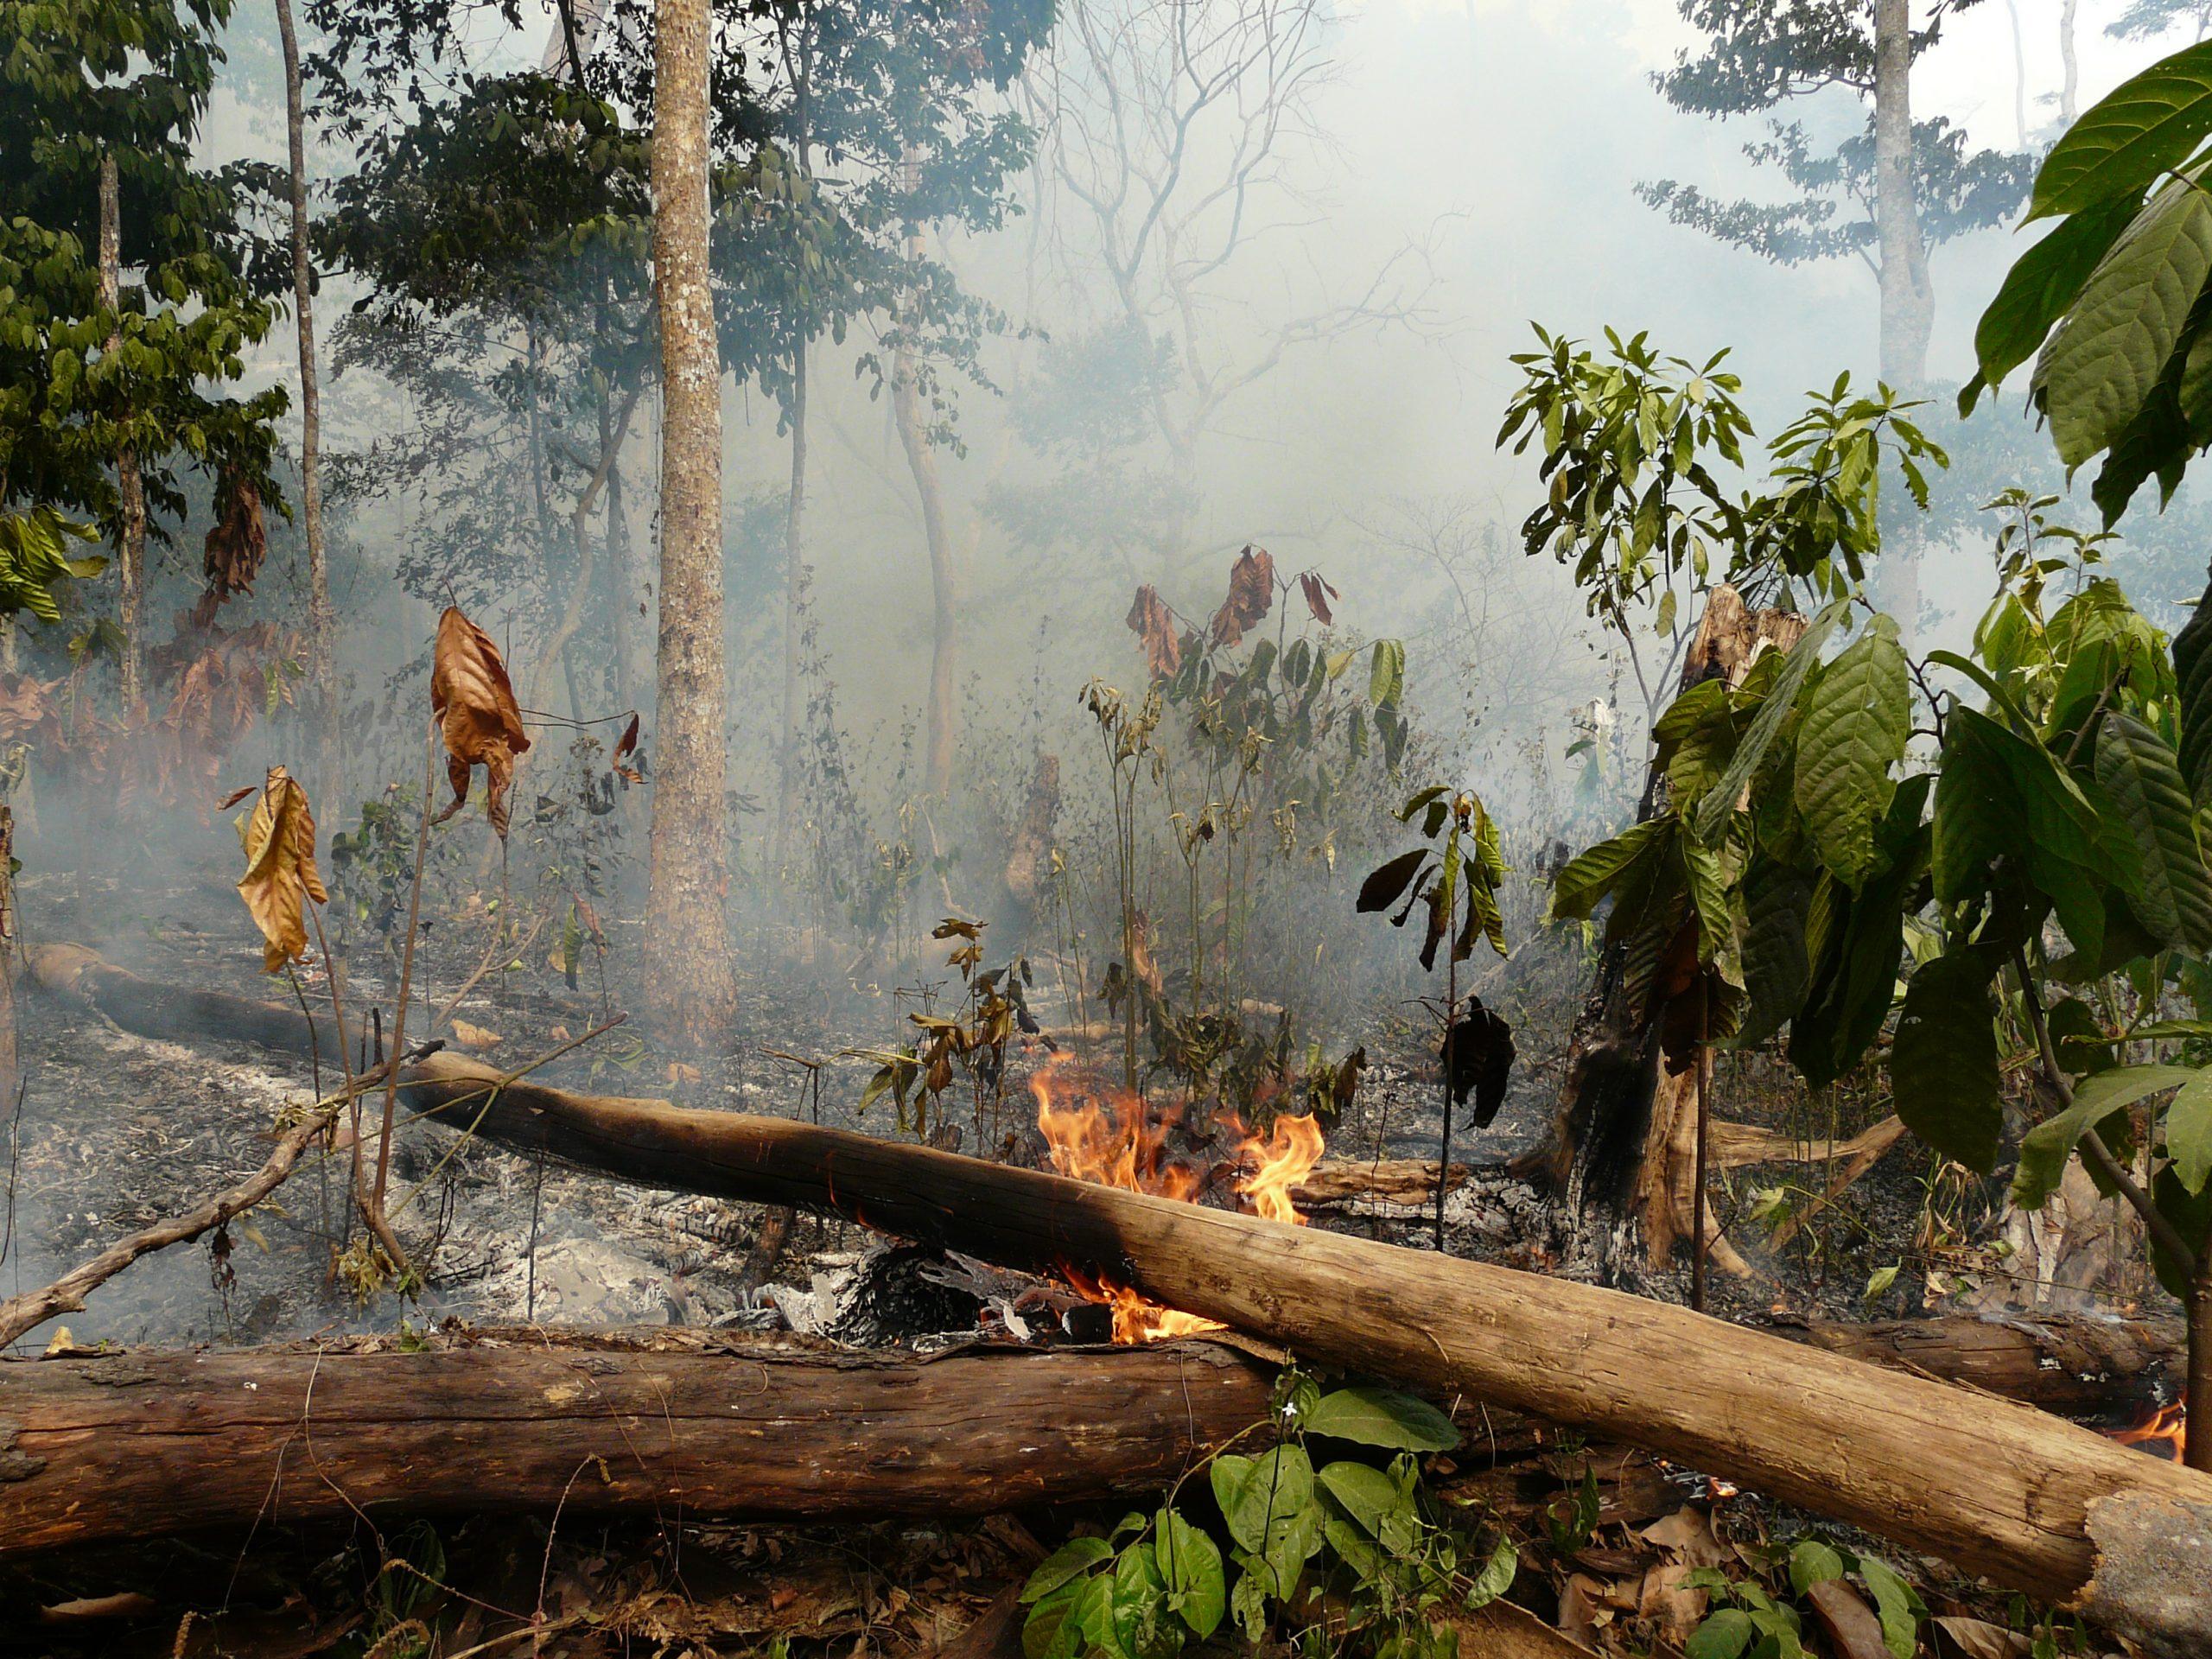 6_Ikemeh_habitatdestruction_February08